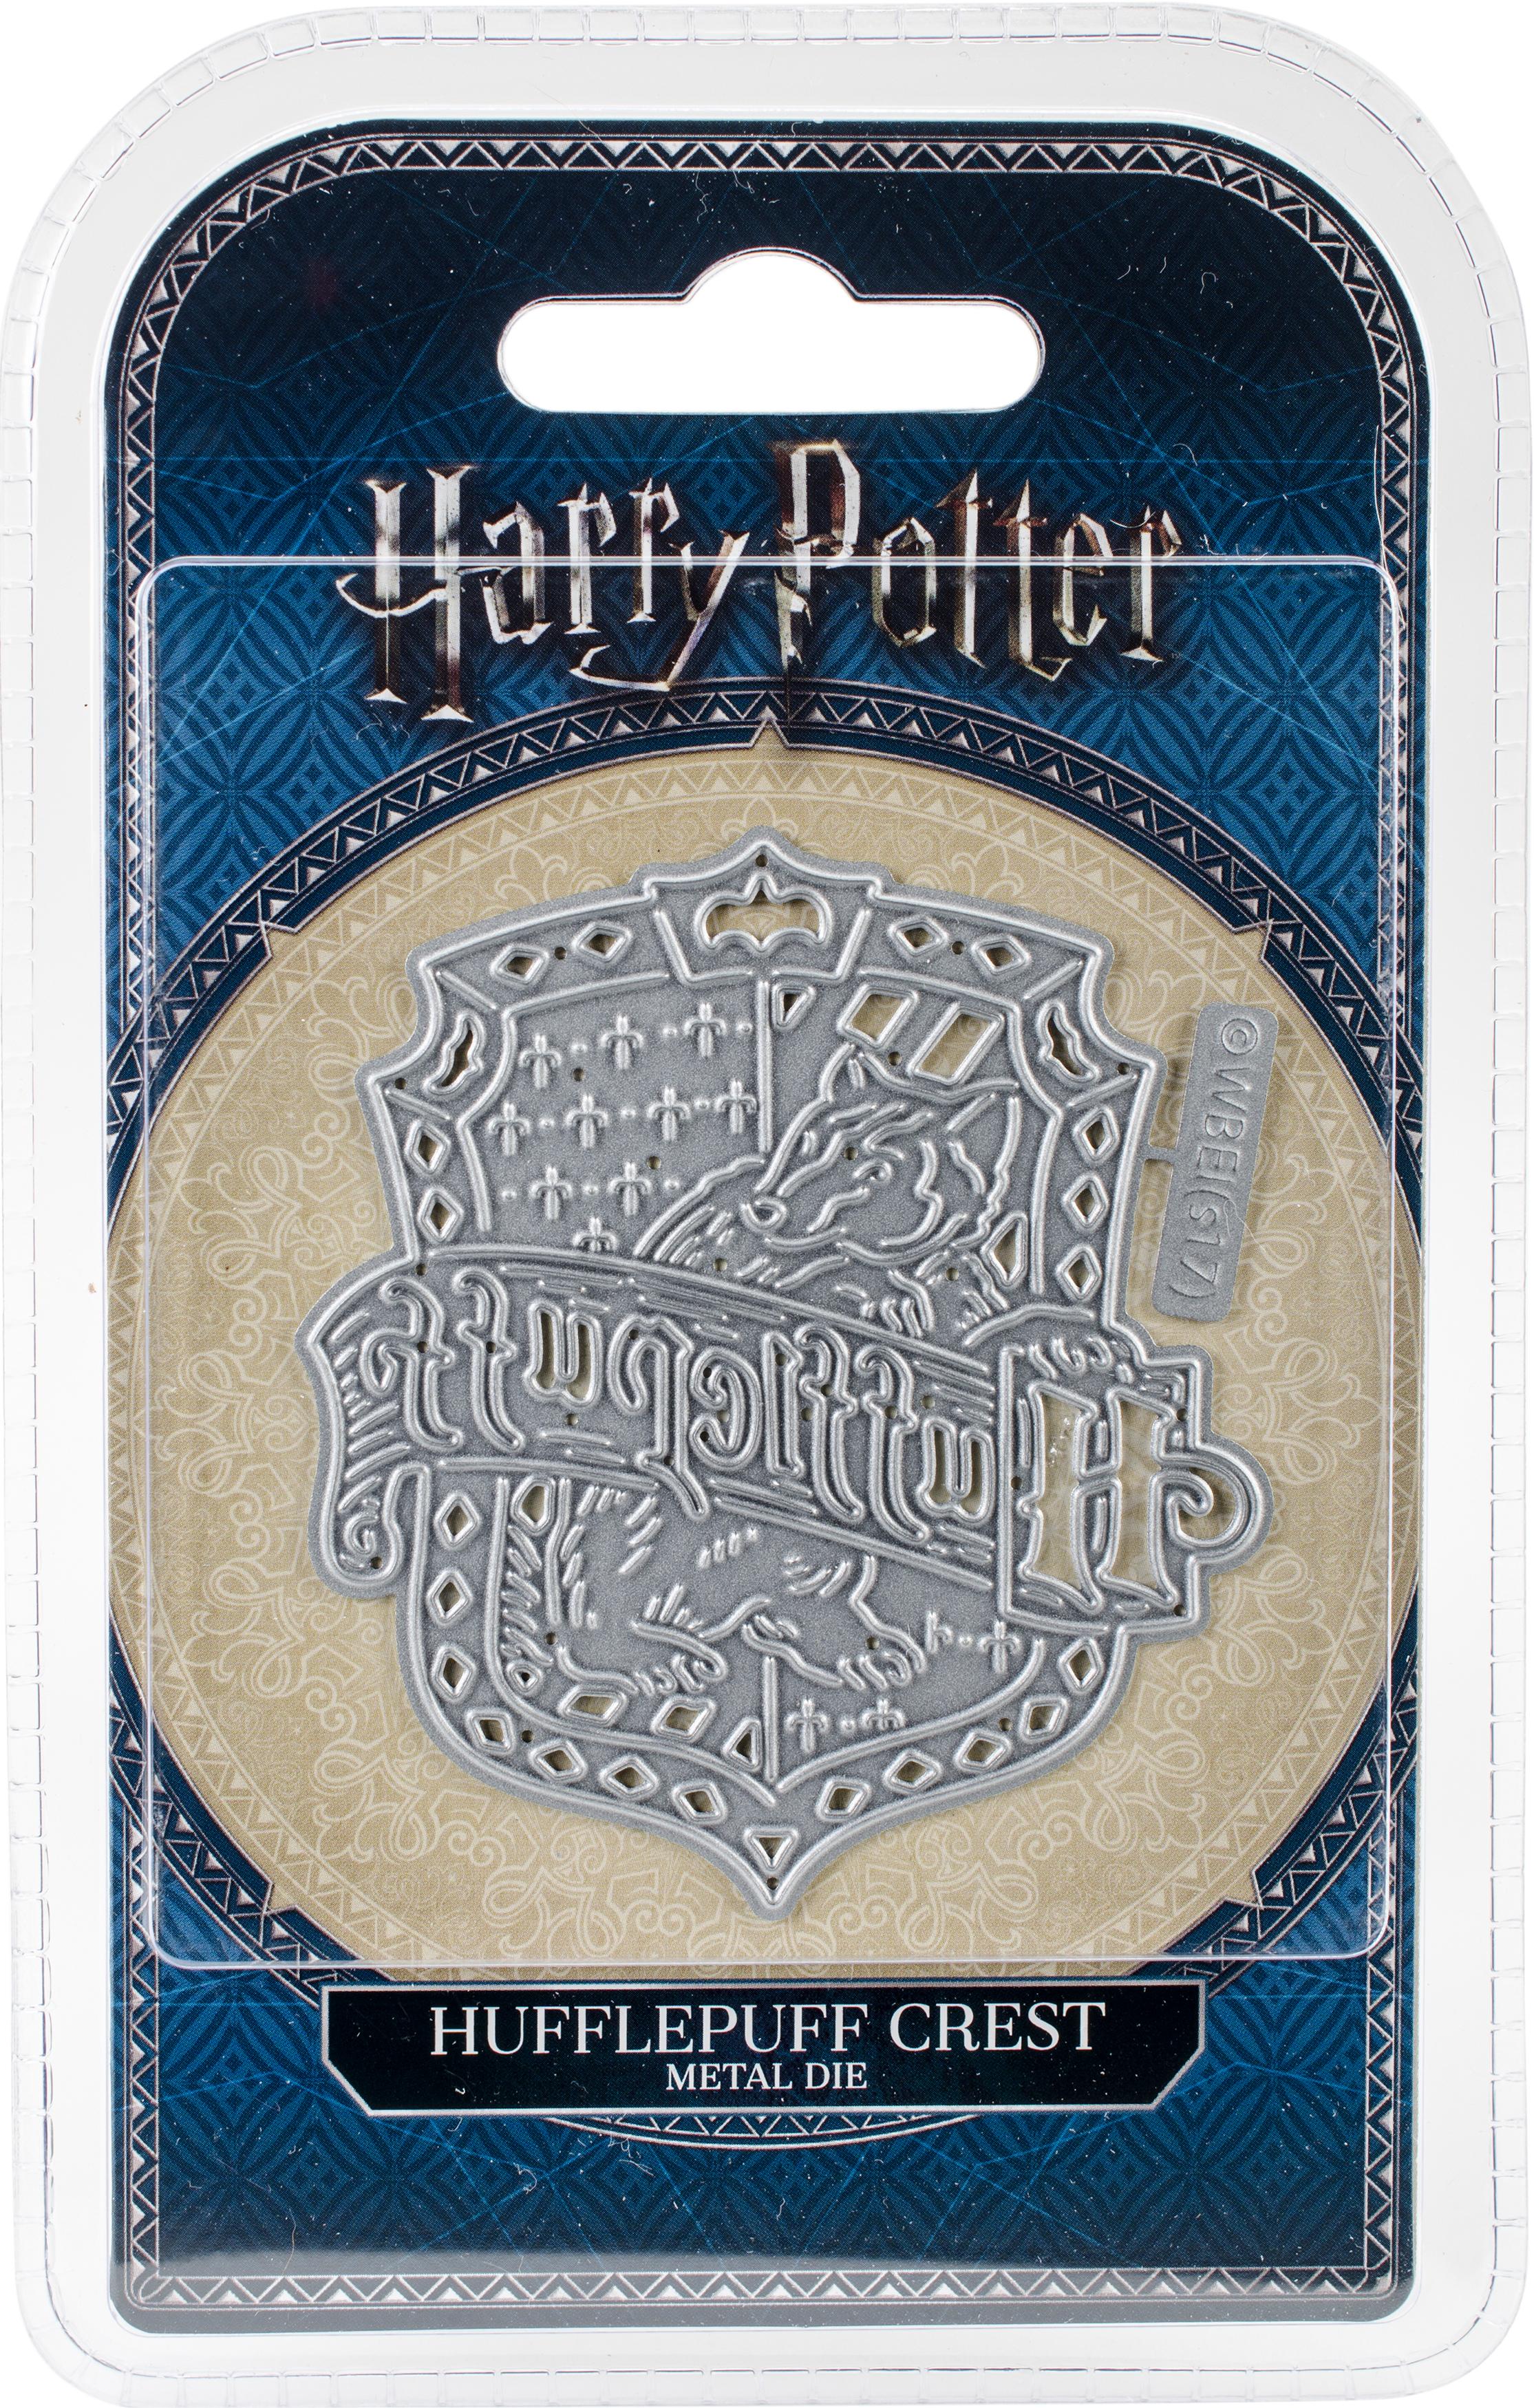 ^Harry Potter Hufflepuff Crest Metal Die